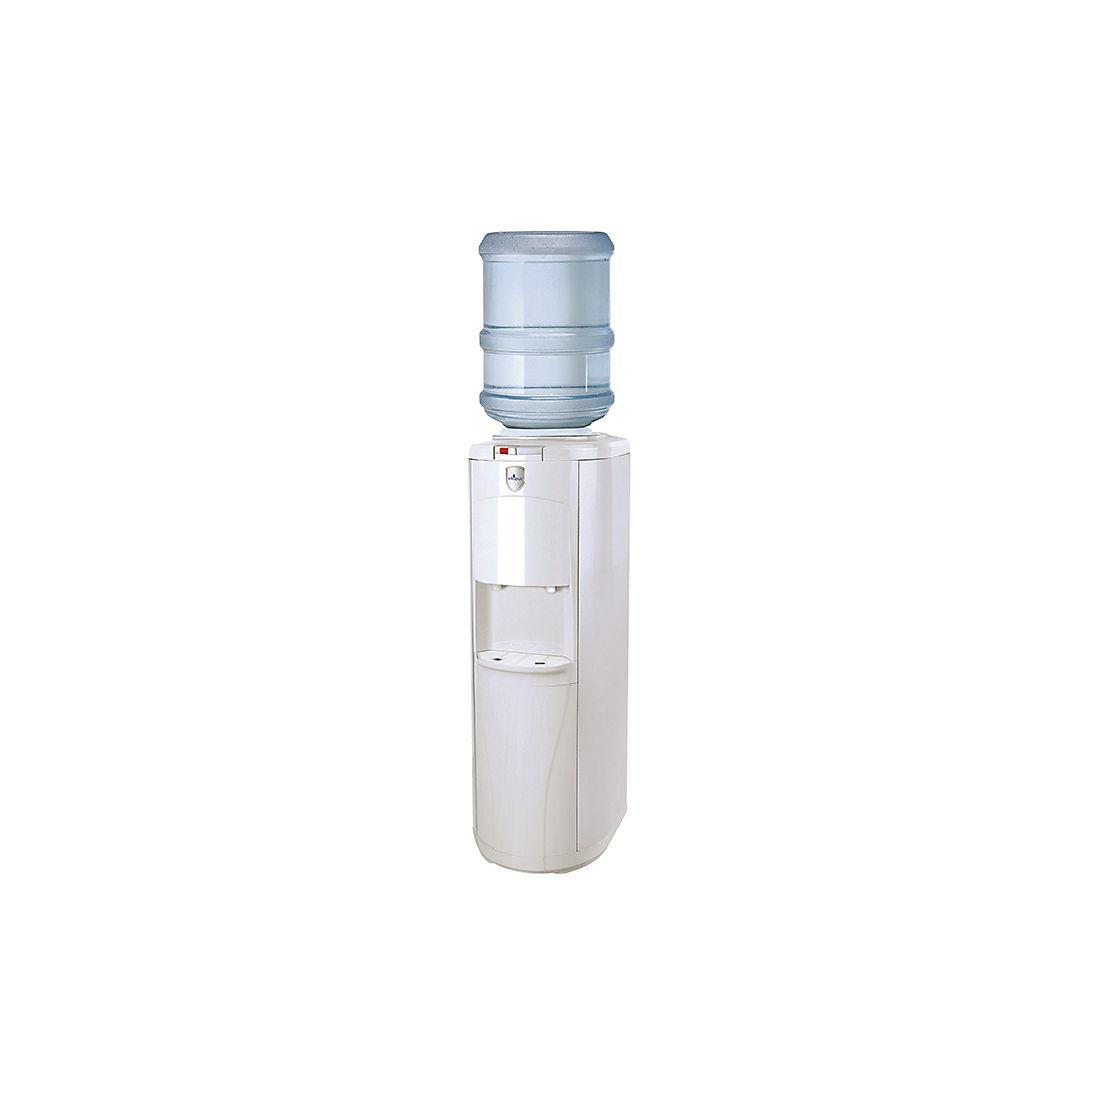 Vitapur Freestanding Top Load Floor Standing Hot & Cold Water Dispenser -  White